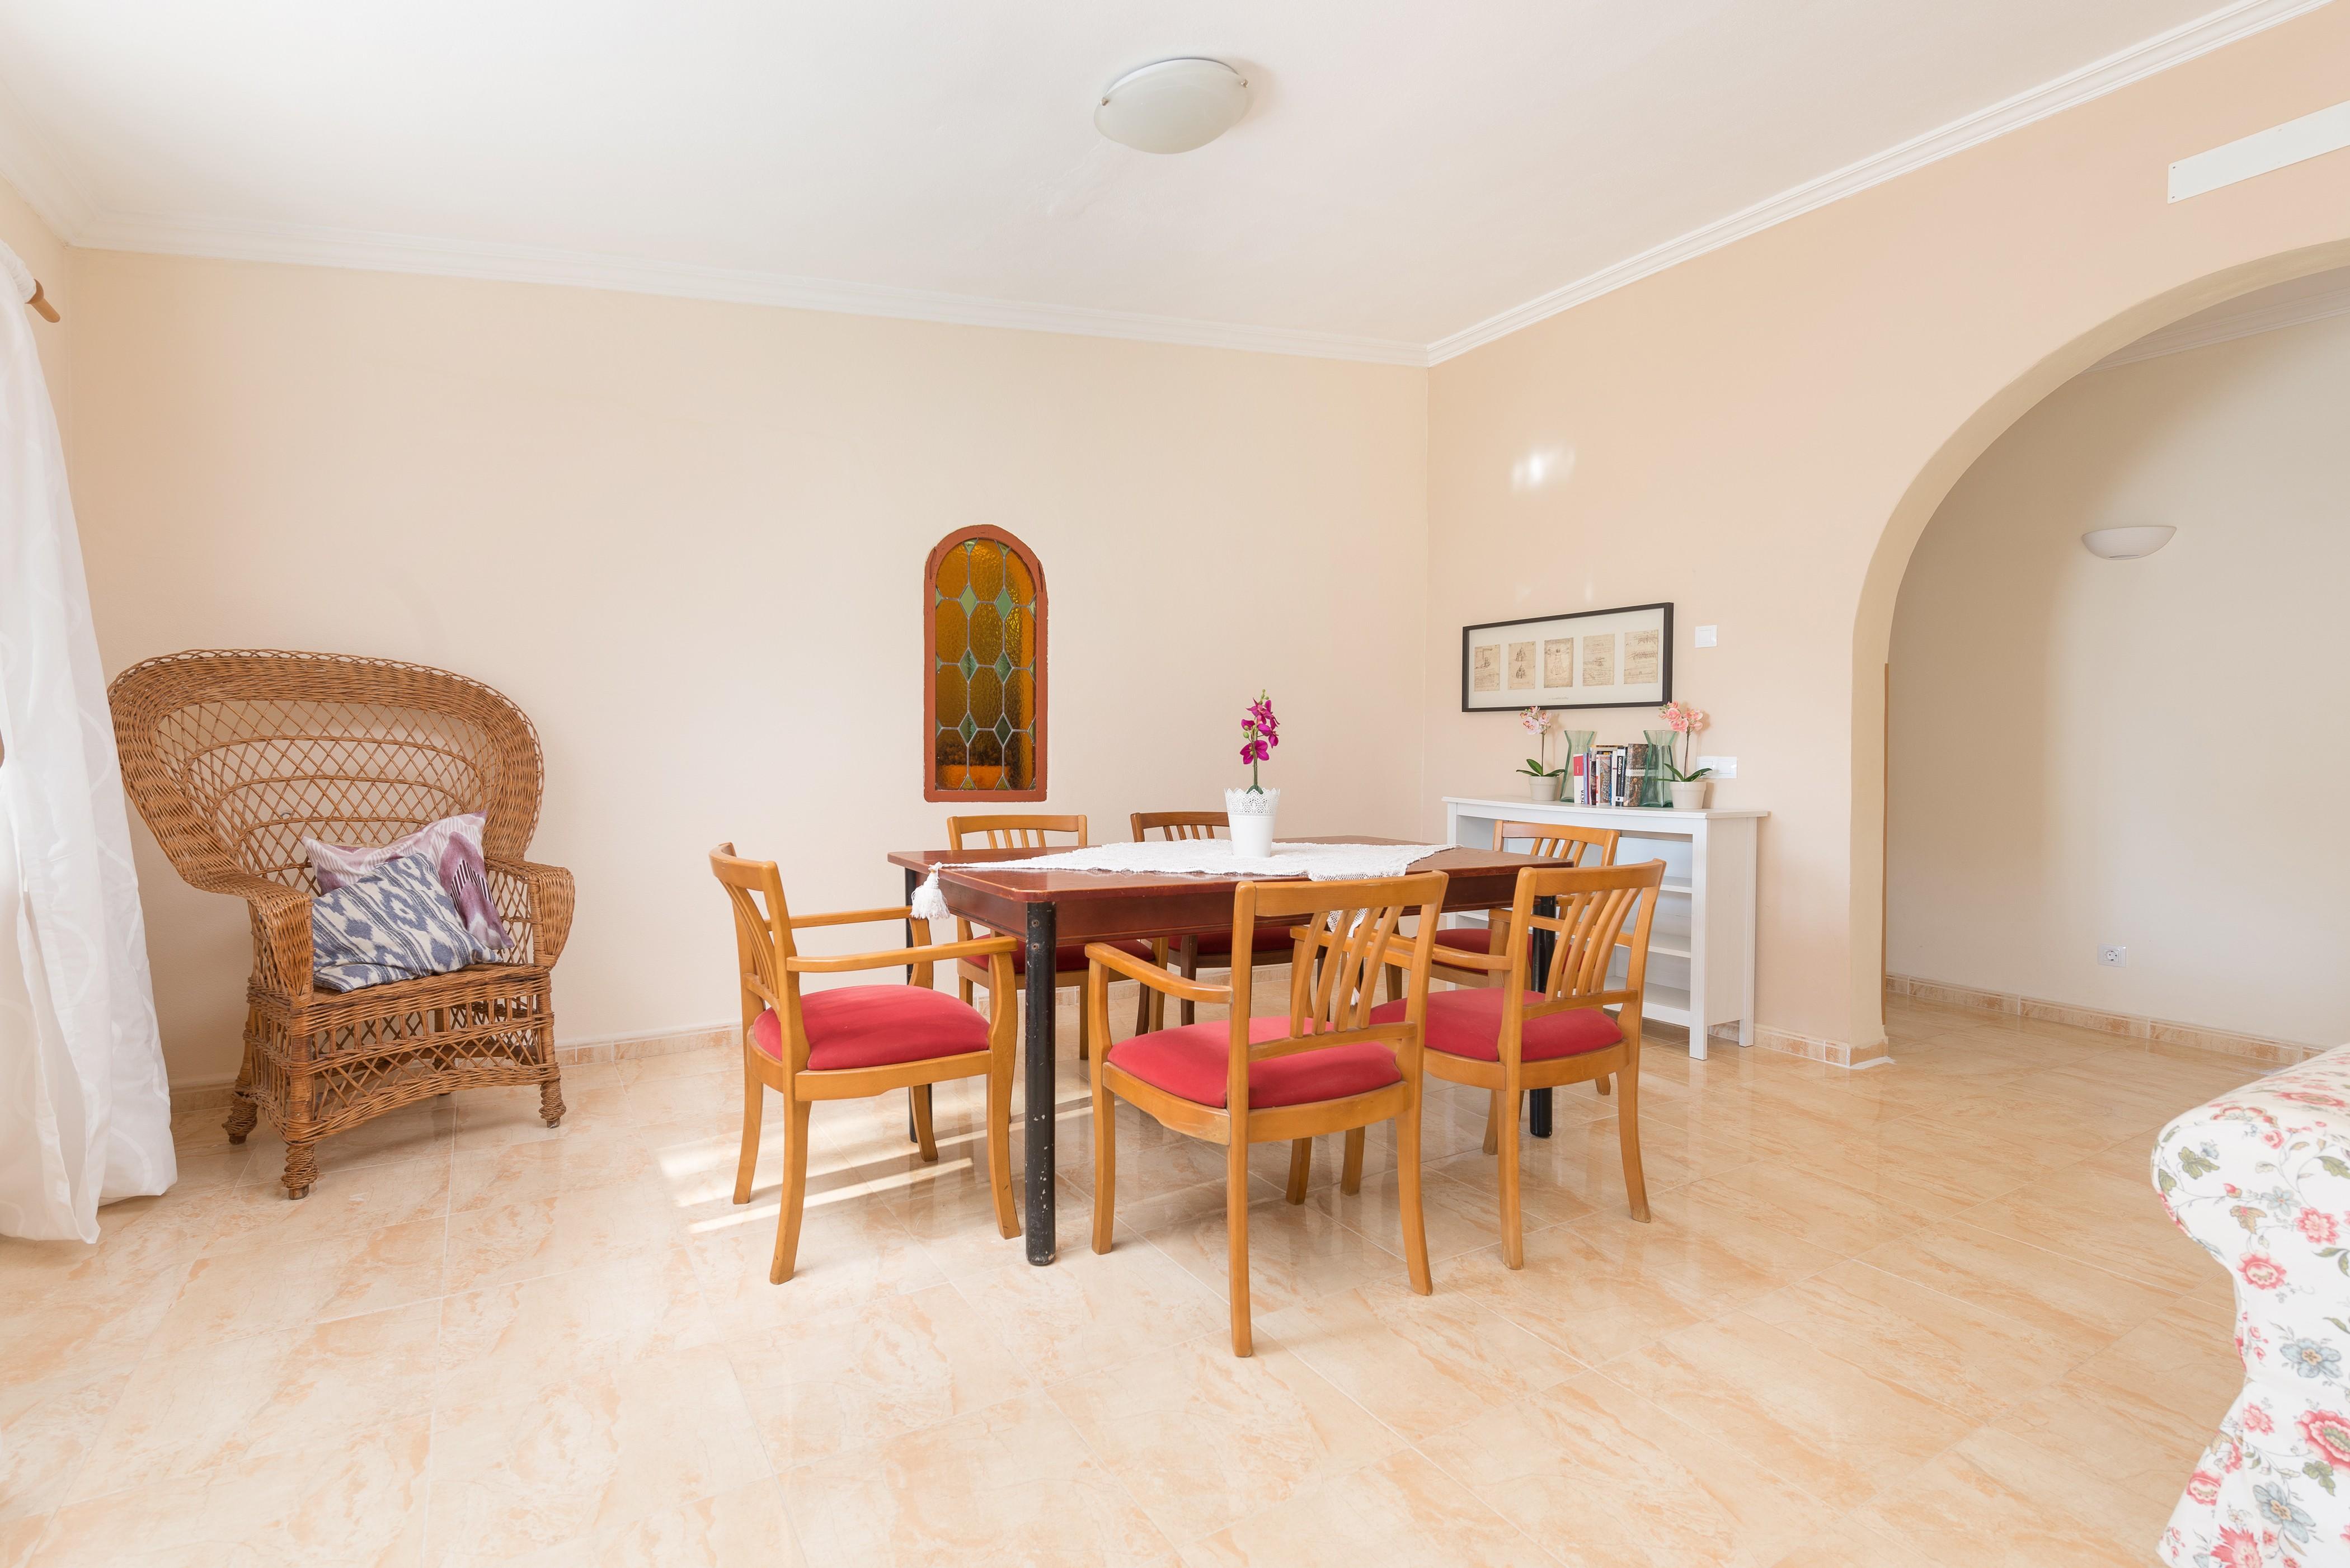 Ferienhaus CAN MOLINA (2063640), Cala Mandia, Mallorca, Balearische Inseln, Spanien, Bild 16